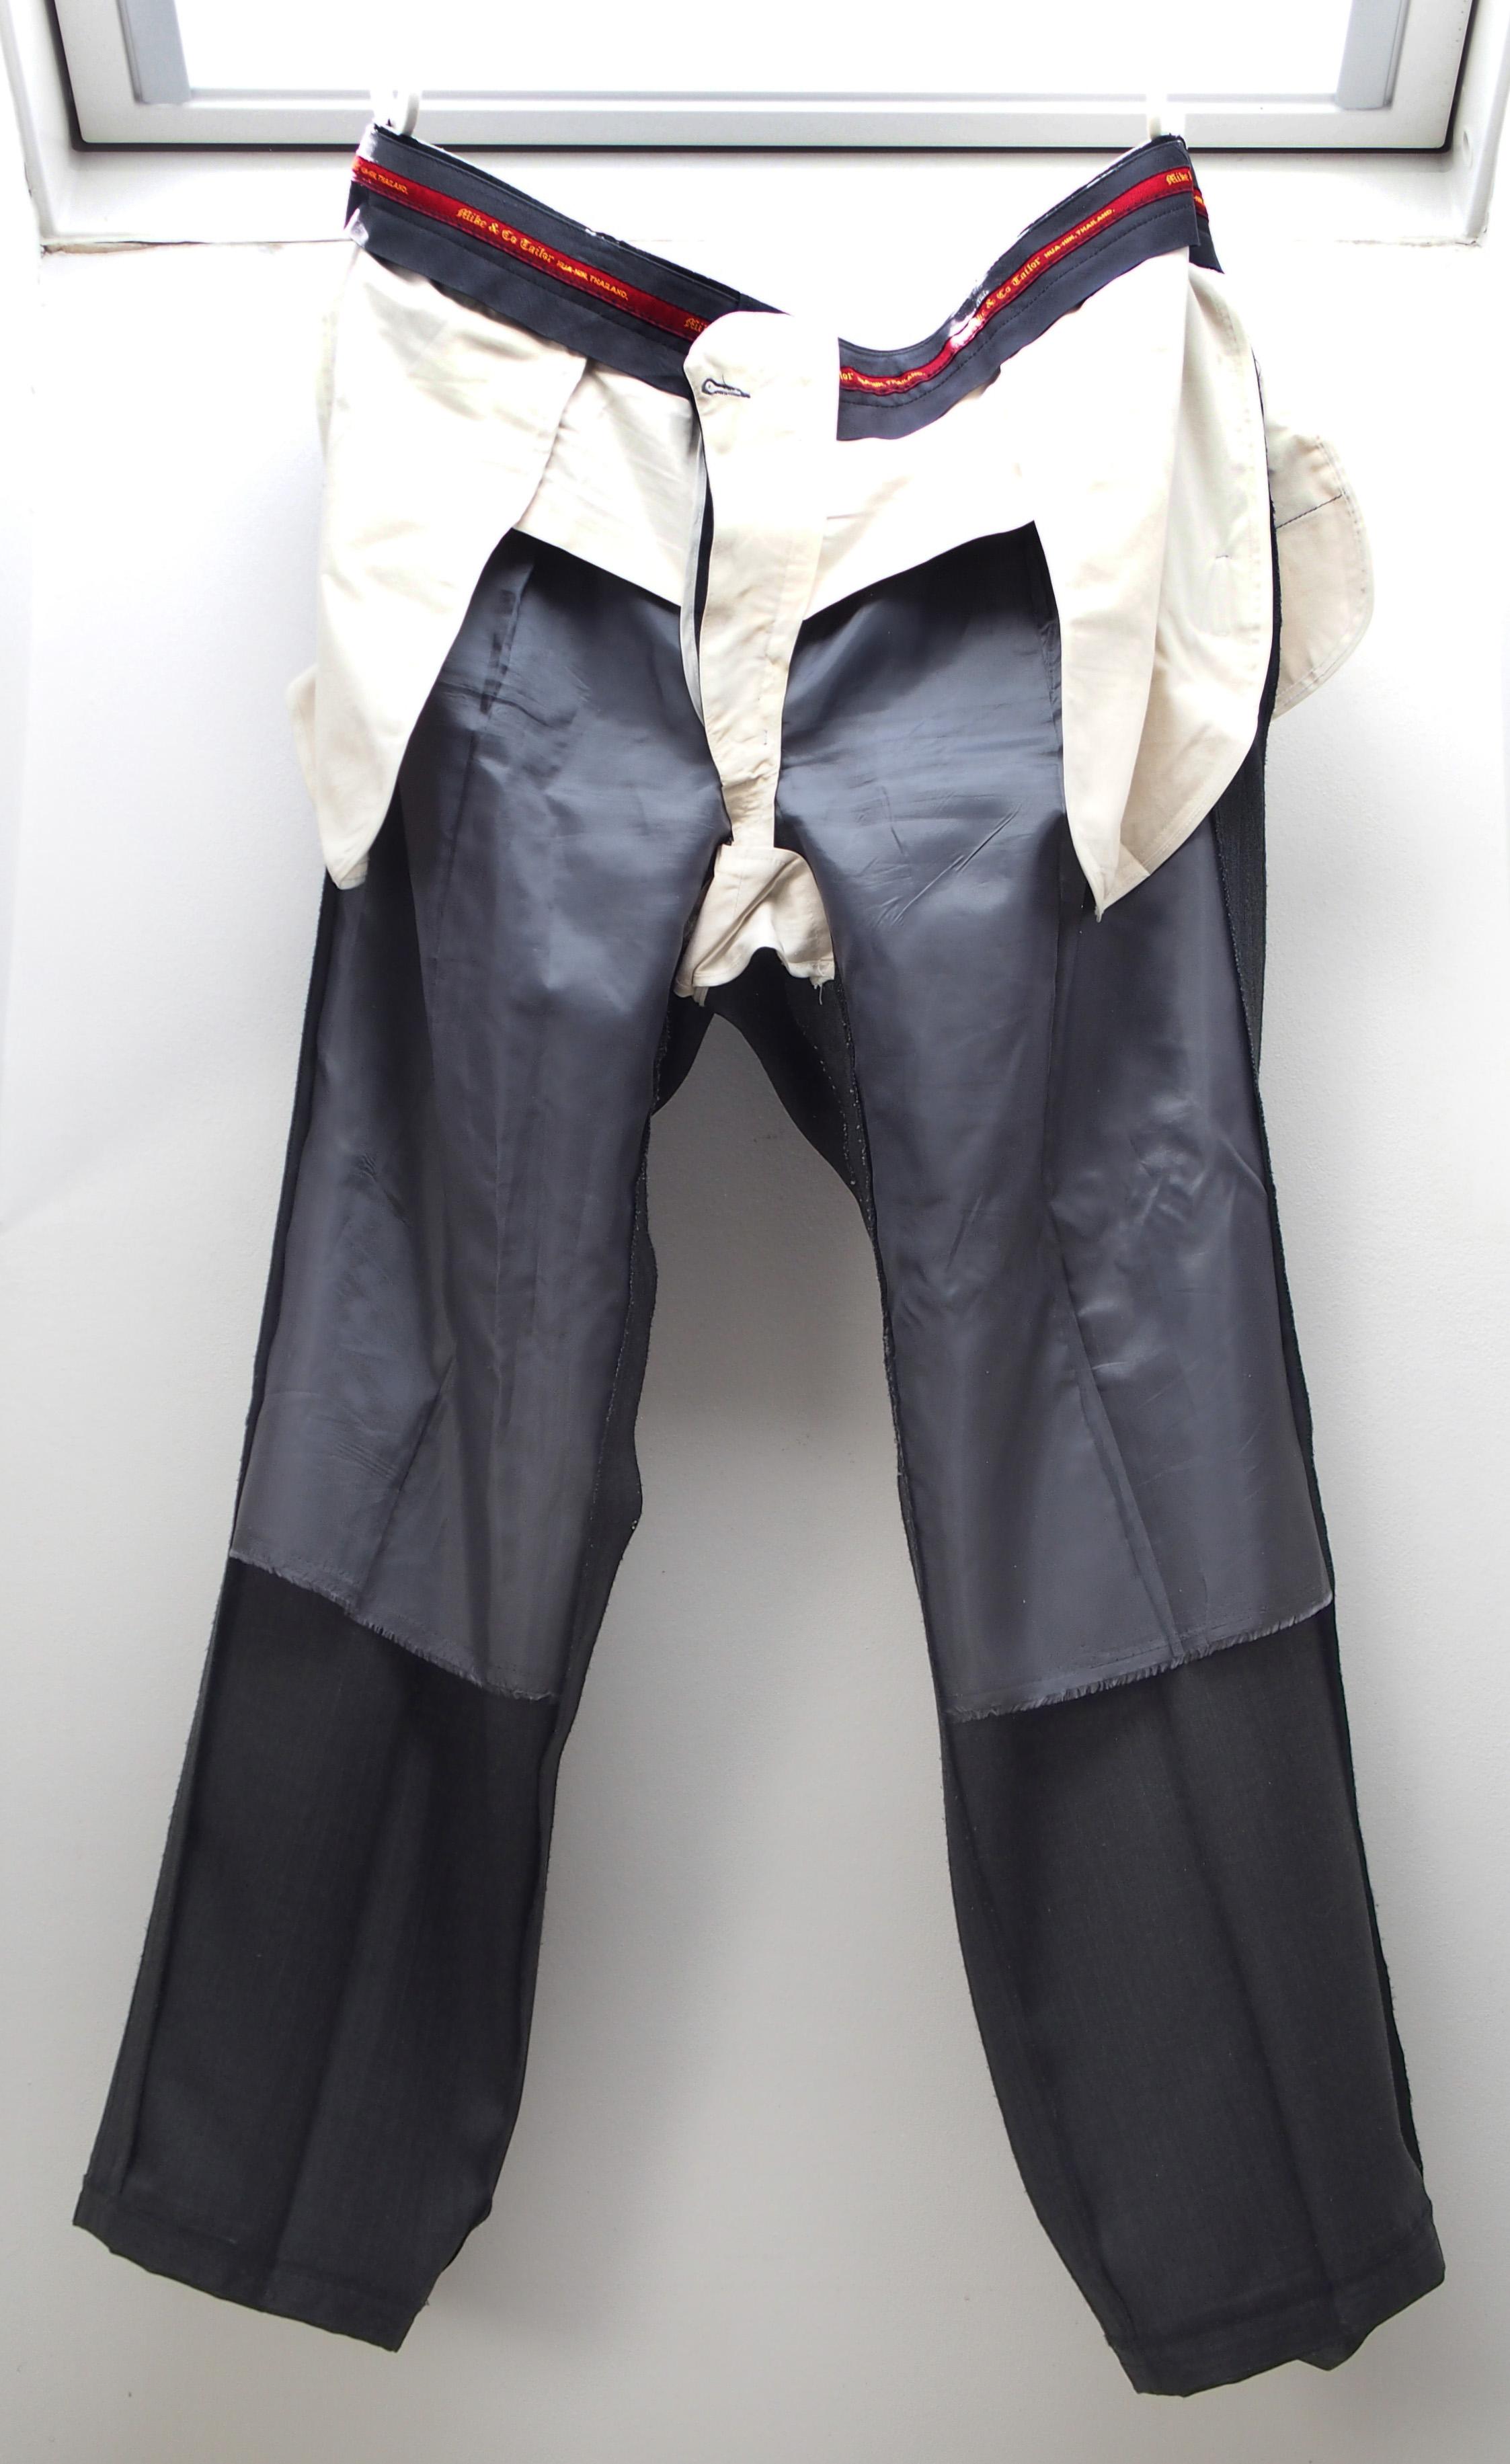 Mens Trousers Inside 5UlEMtq6